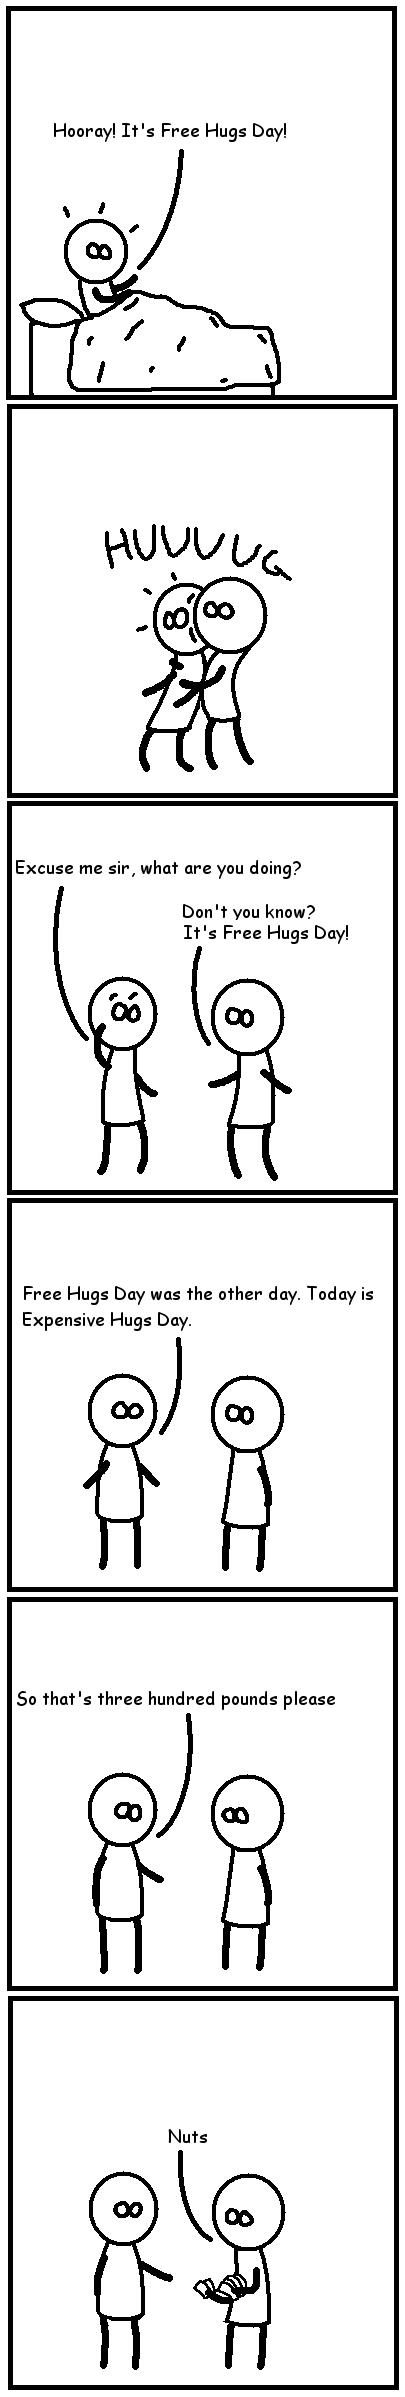 Hugs 2 - Hug Harder